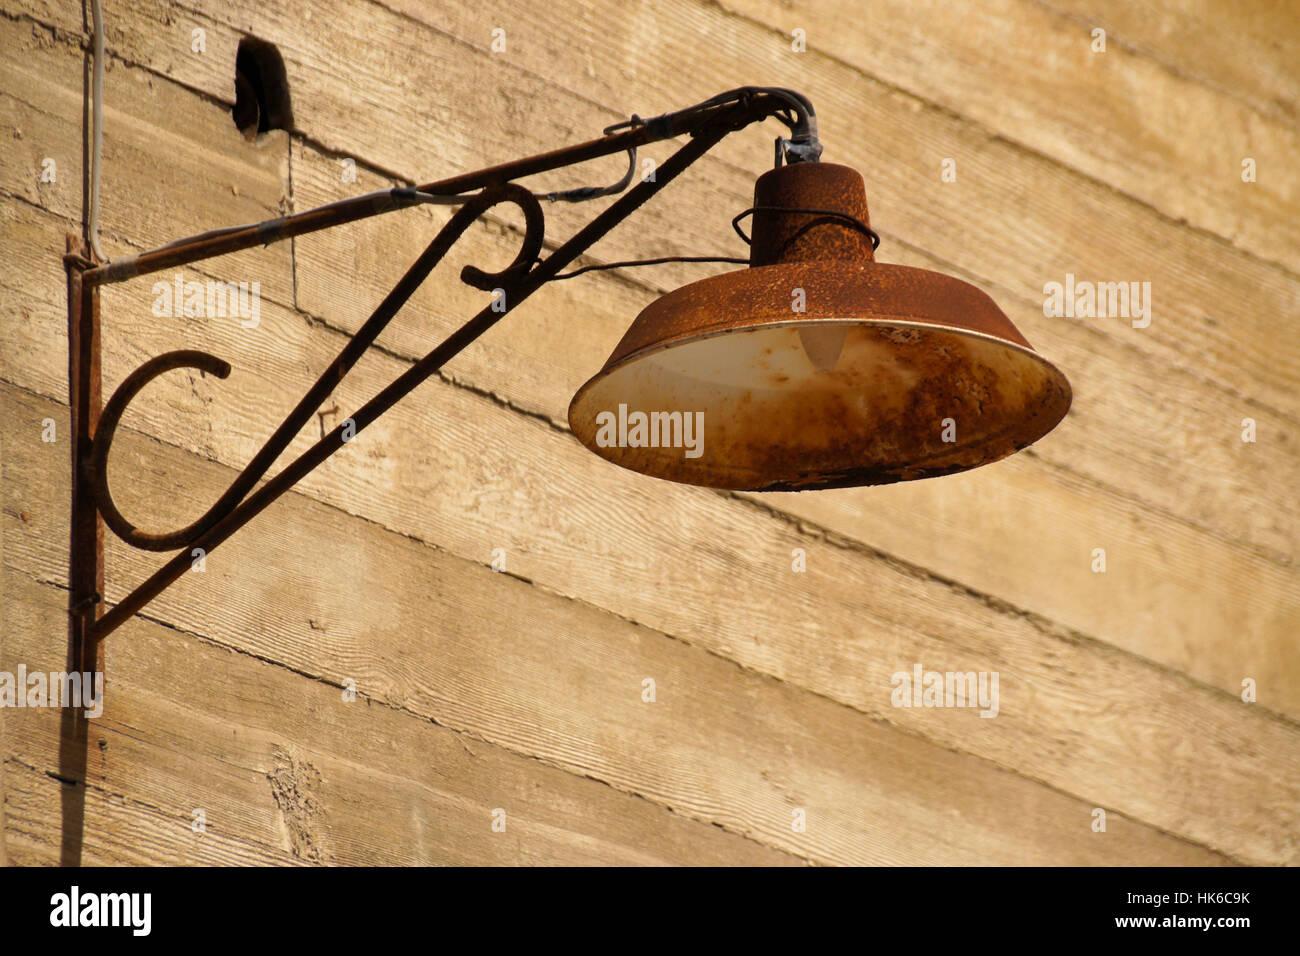 Rusty light fixture, Santiago Humberstone Oficina Salitrera, Atacama Desert, Norte Grande, Chile - Stock Image